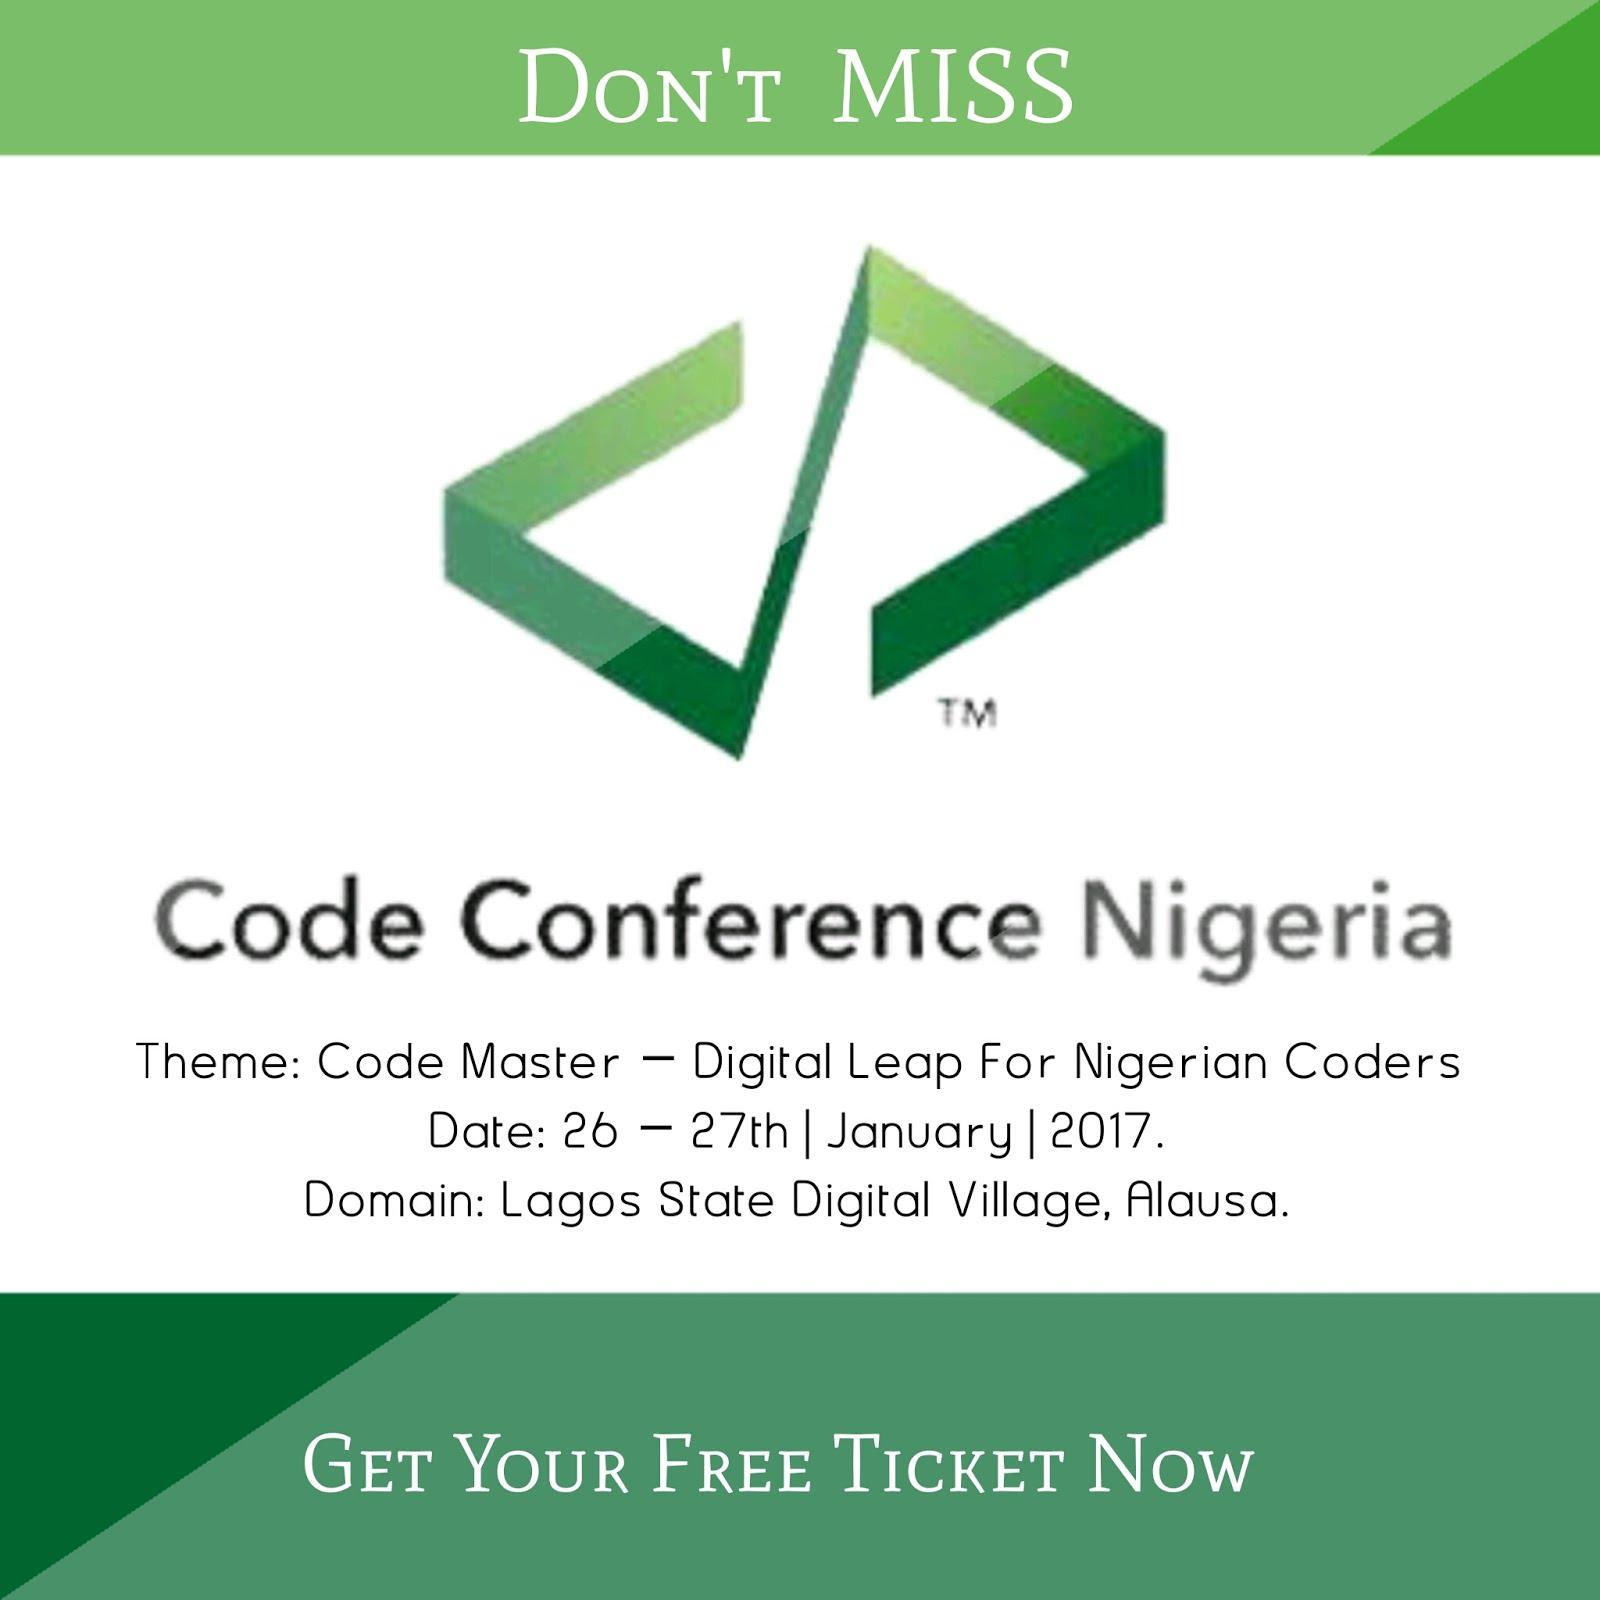 Code Conference Nigeria